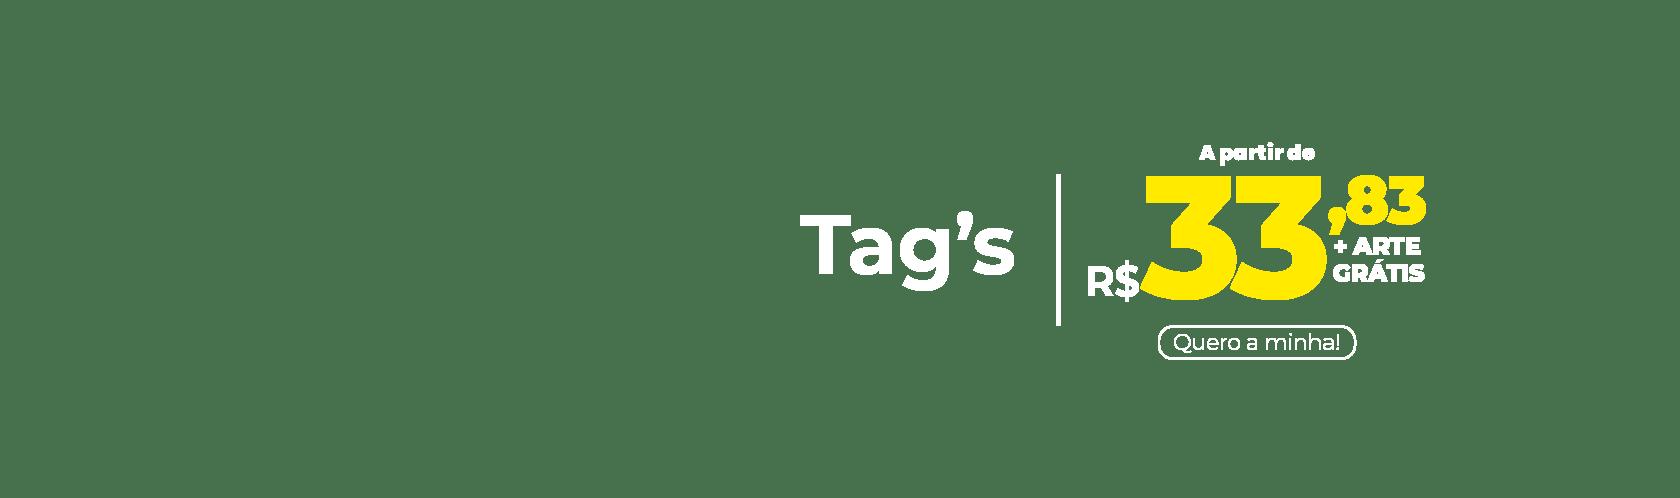 data/site-papira/banner-papira/texto-tag-papira.png